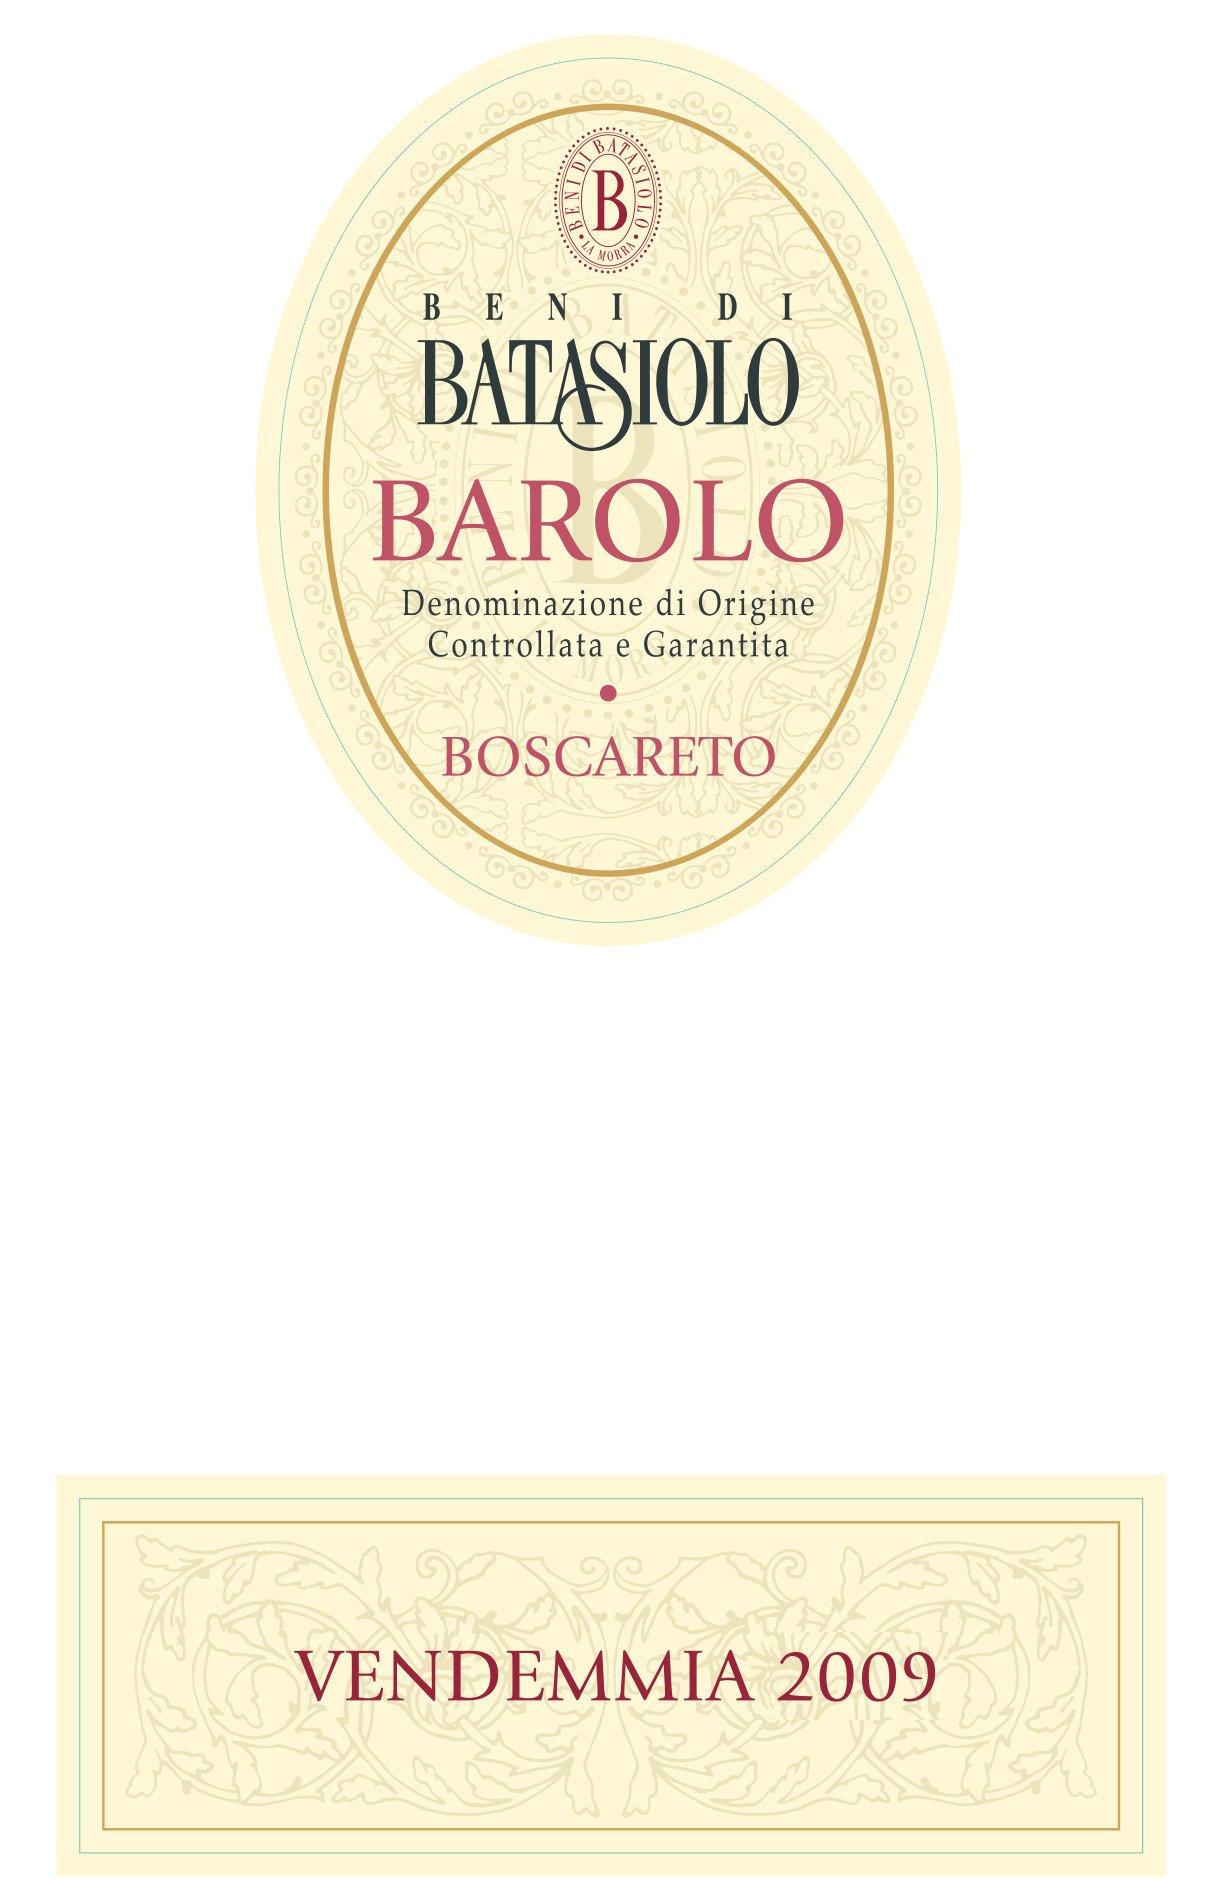 Batasiolo Barolo Boscareto 2009